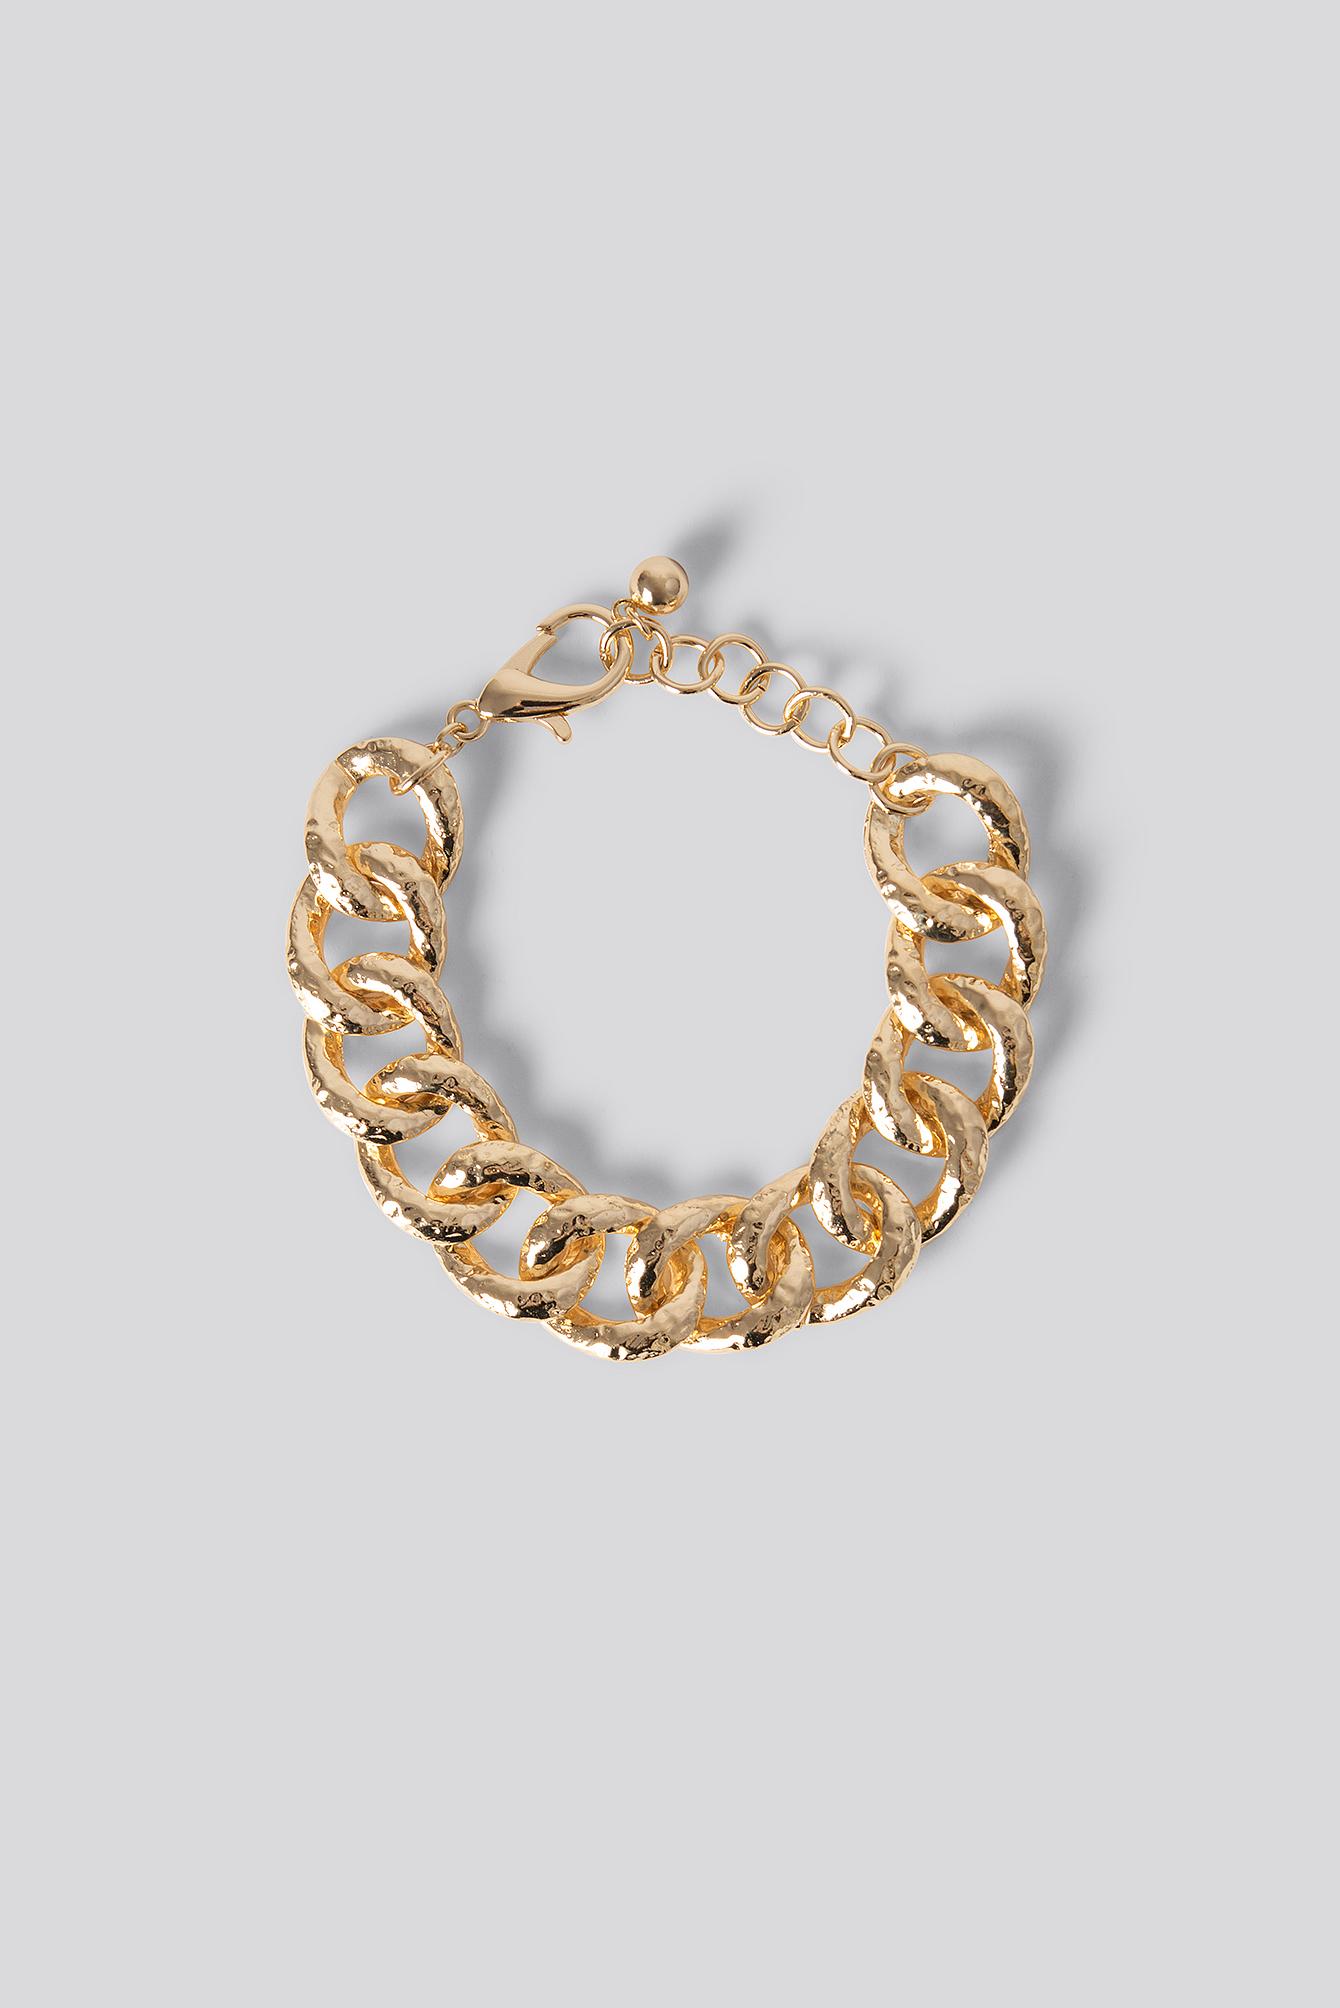 na-kd accessories -  Vintage Look Chain Bracelet - Gold